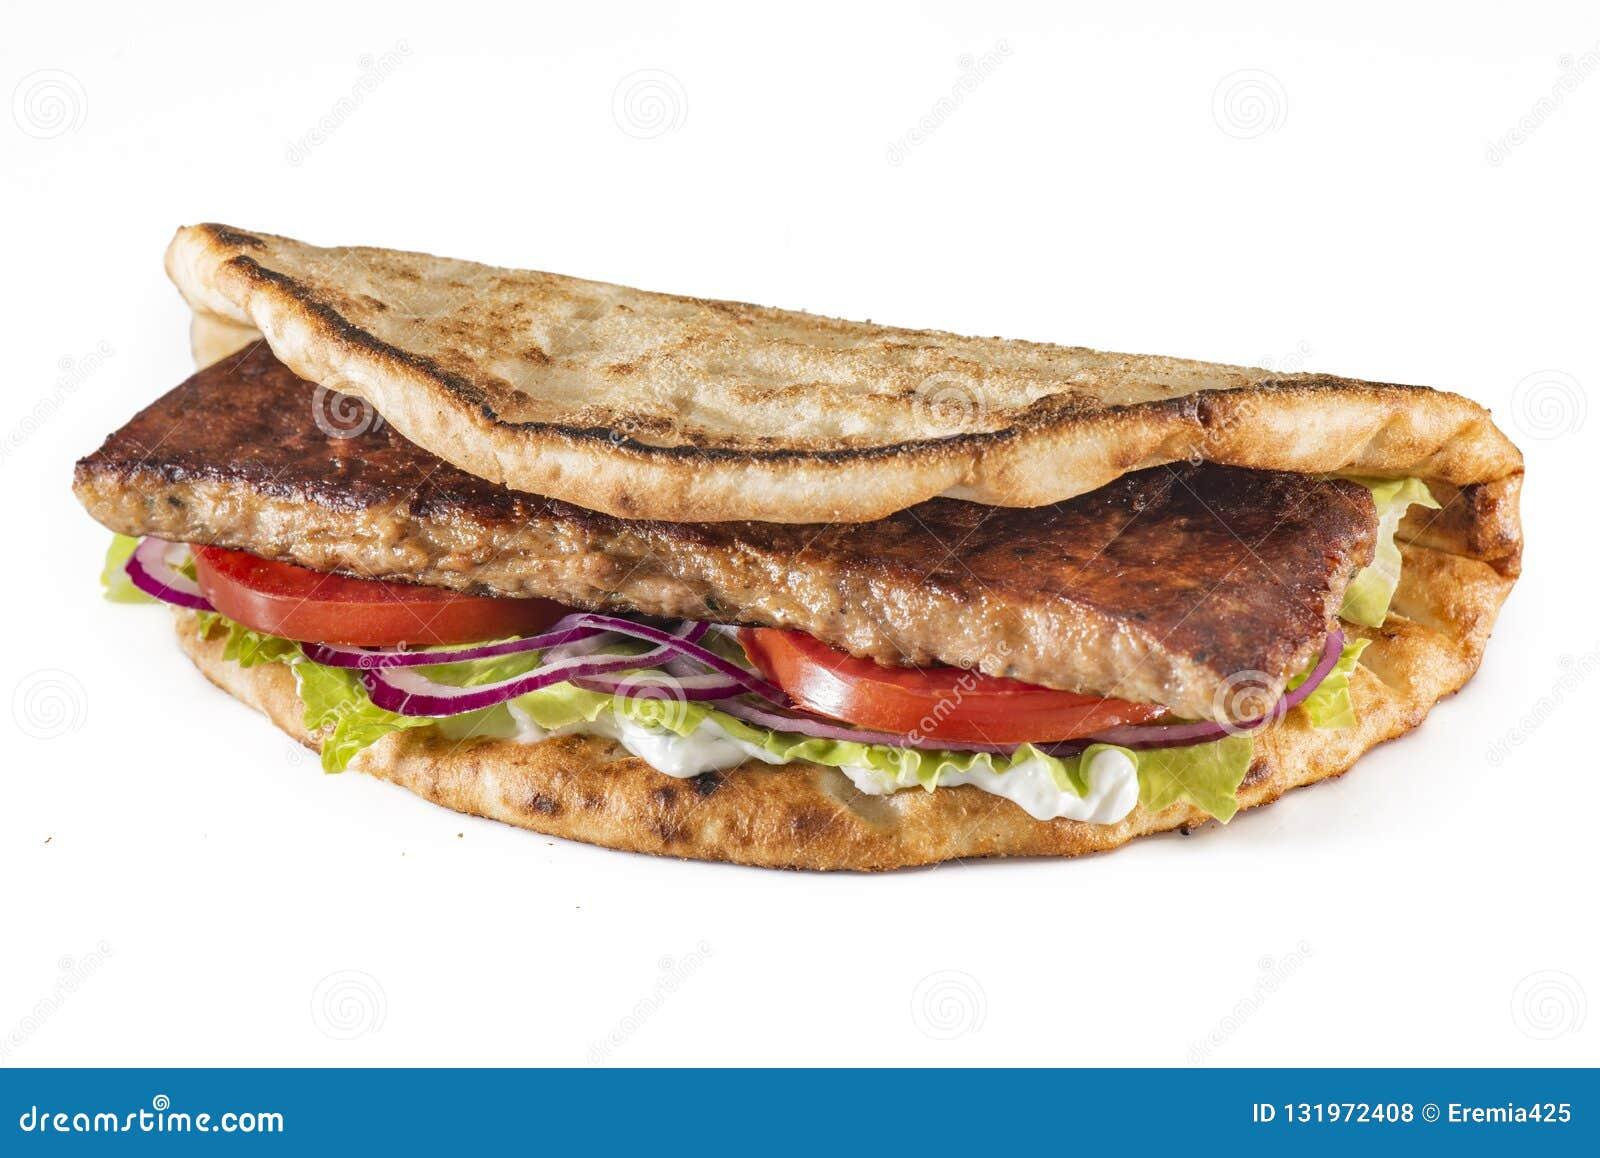 Пита с курицей и дзадзики - пошаговый рецепт с фото на Повар.ру | 1157x1600